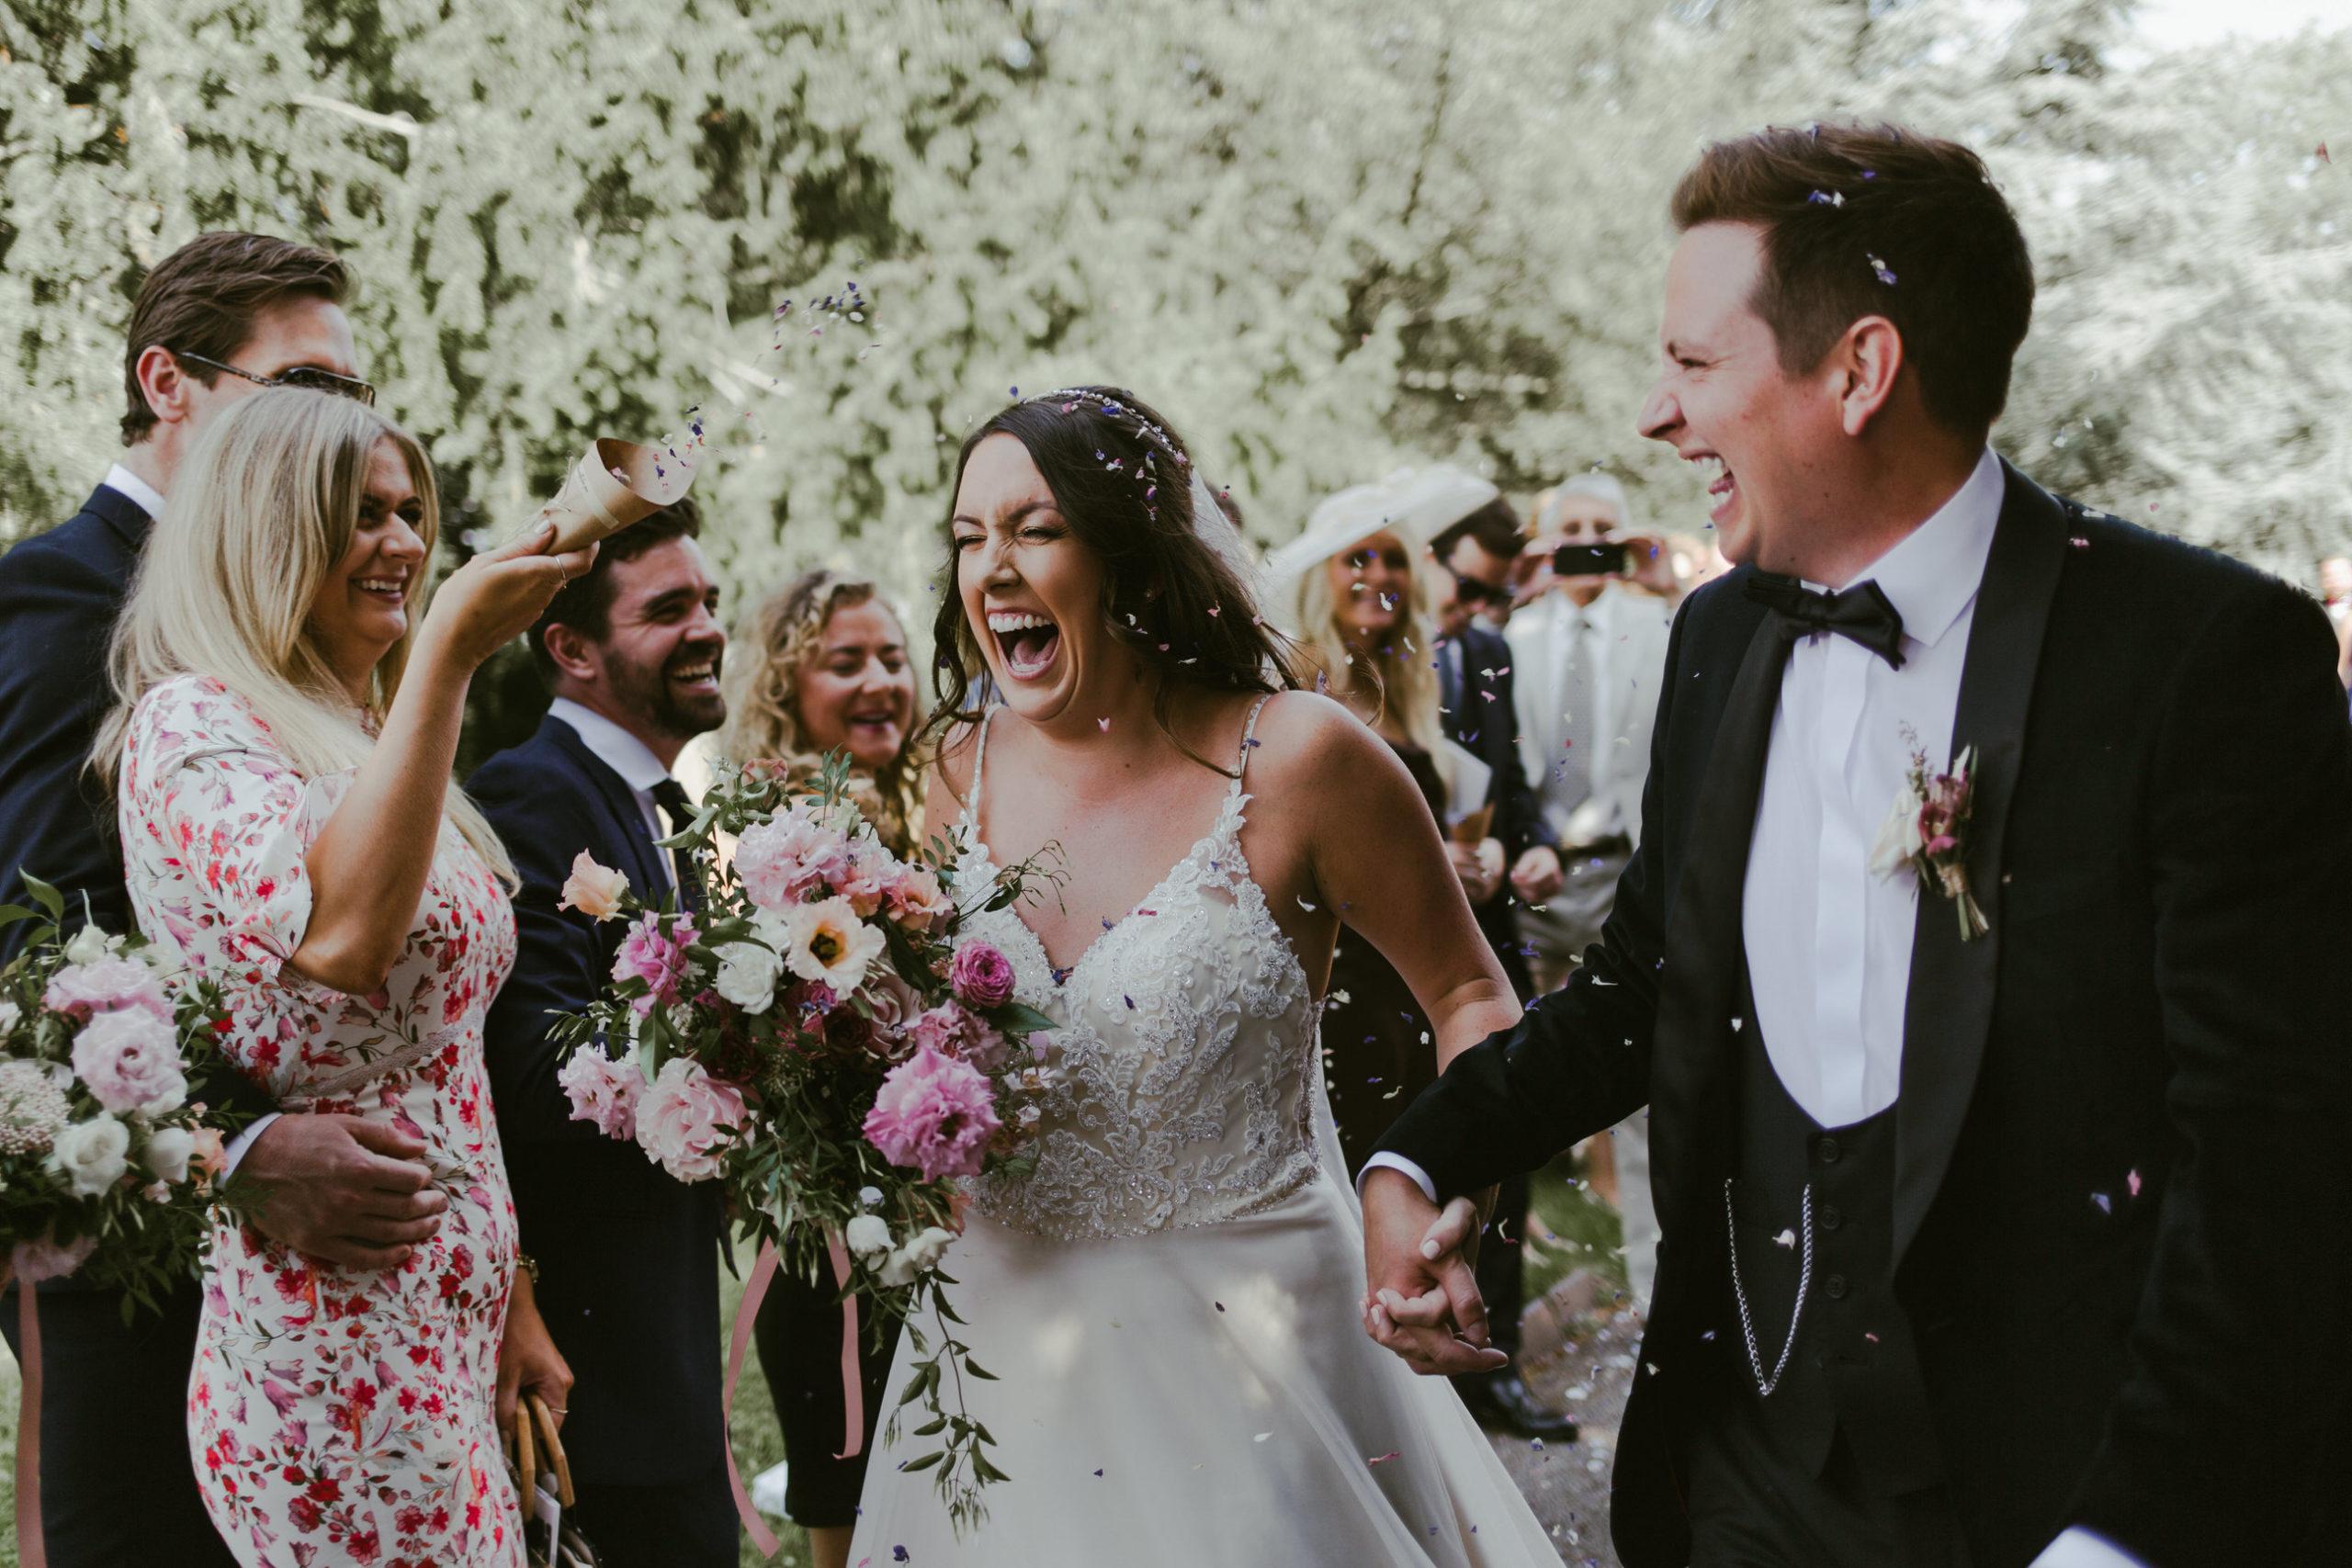 wedding church ceremony bride and groom confetti